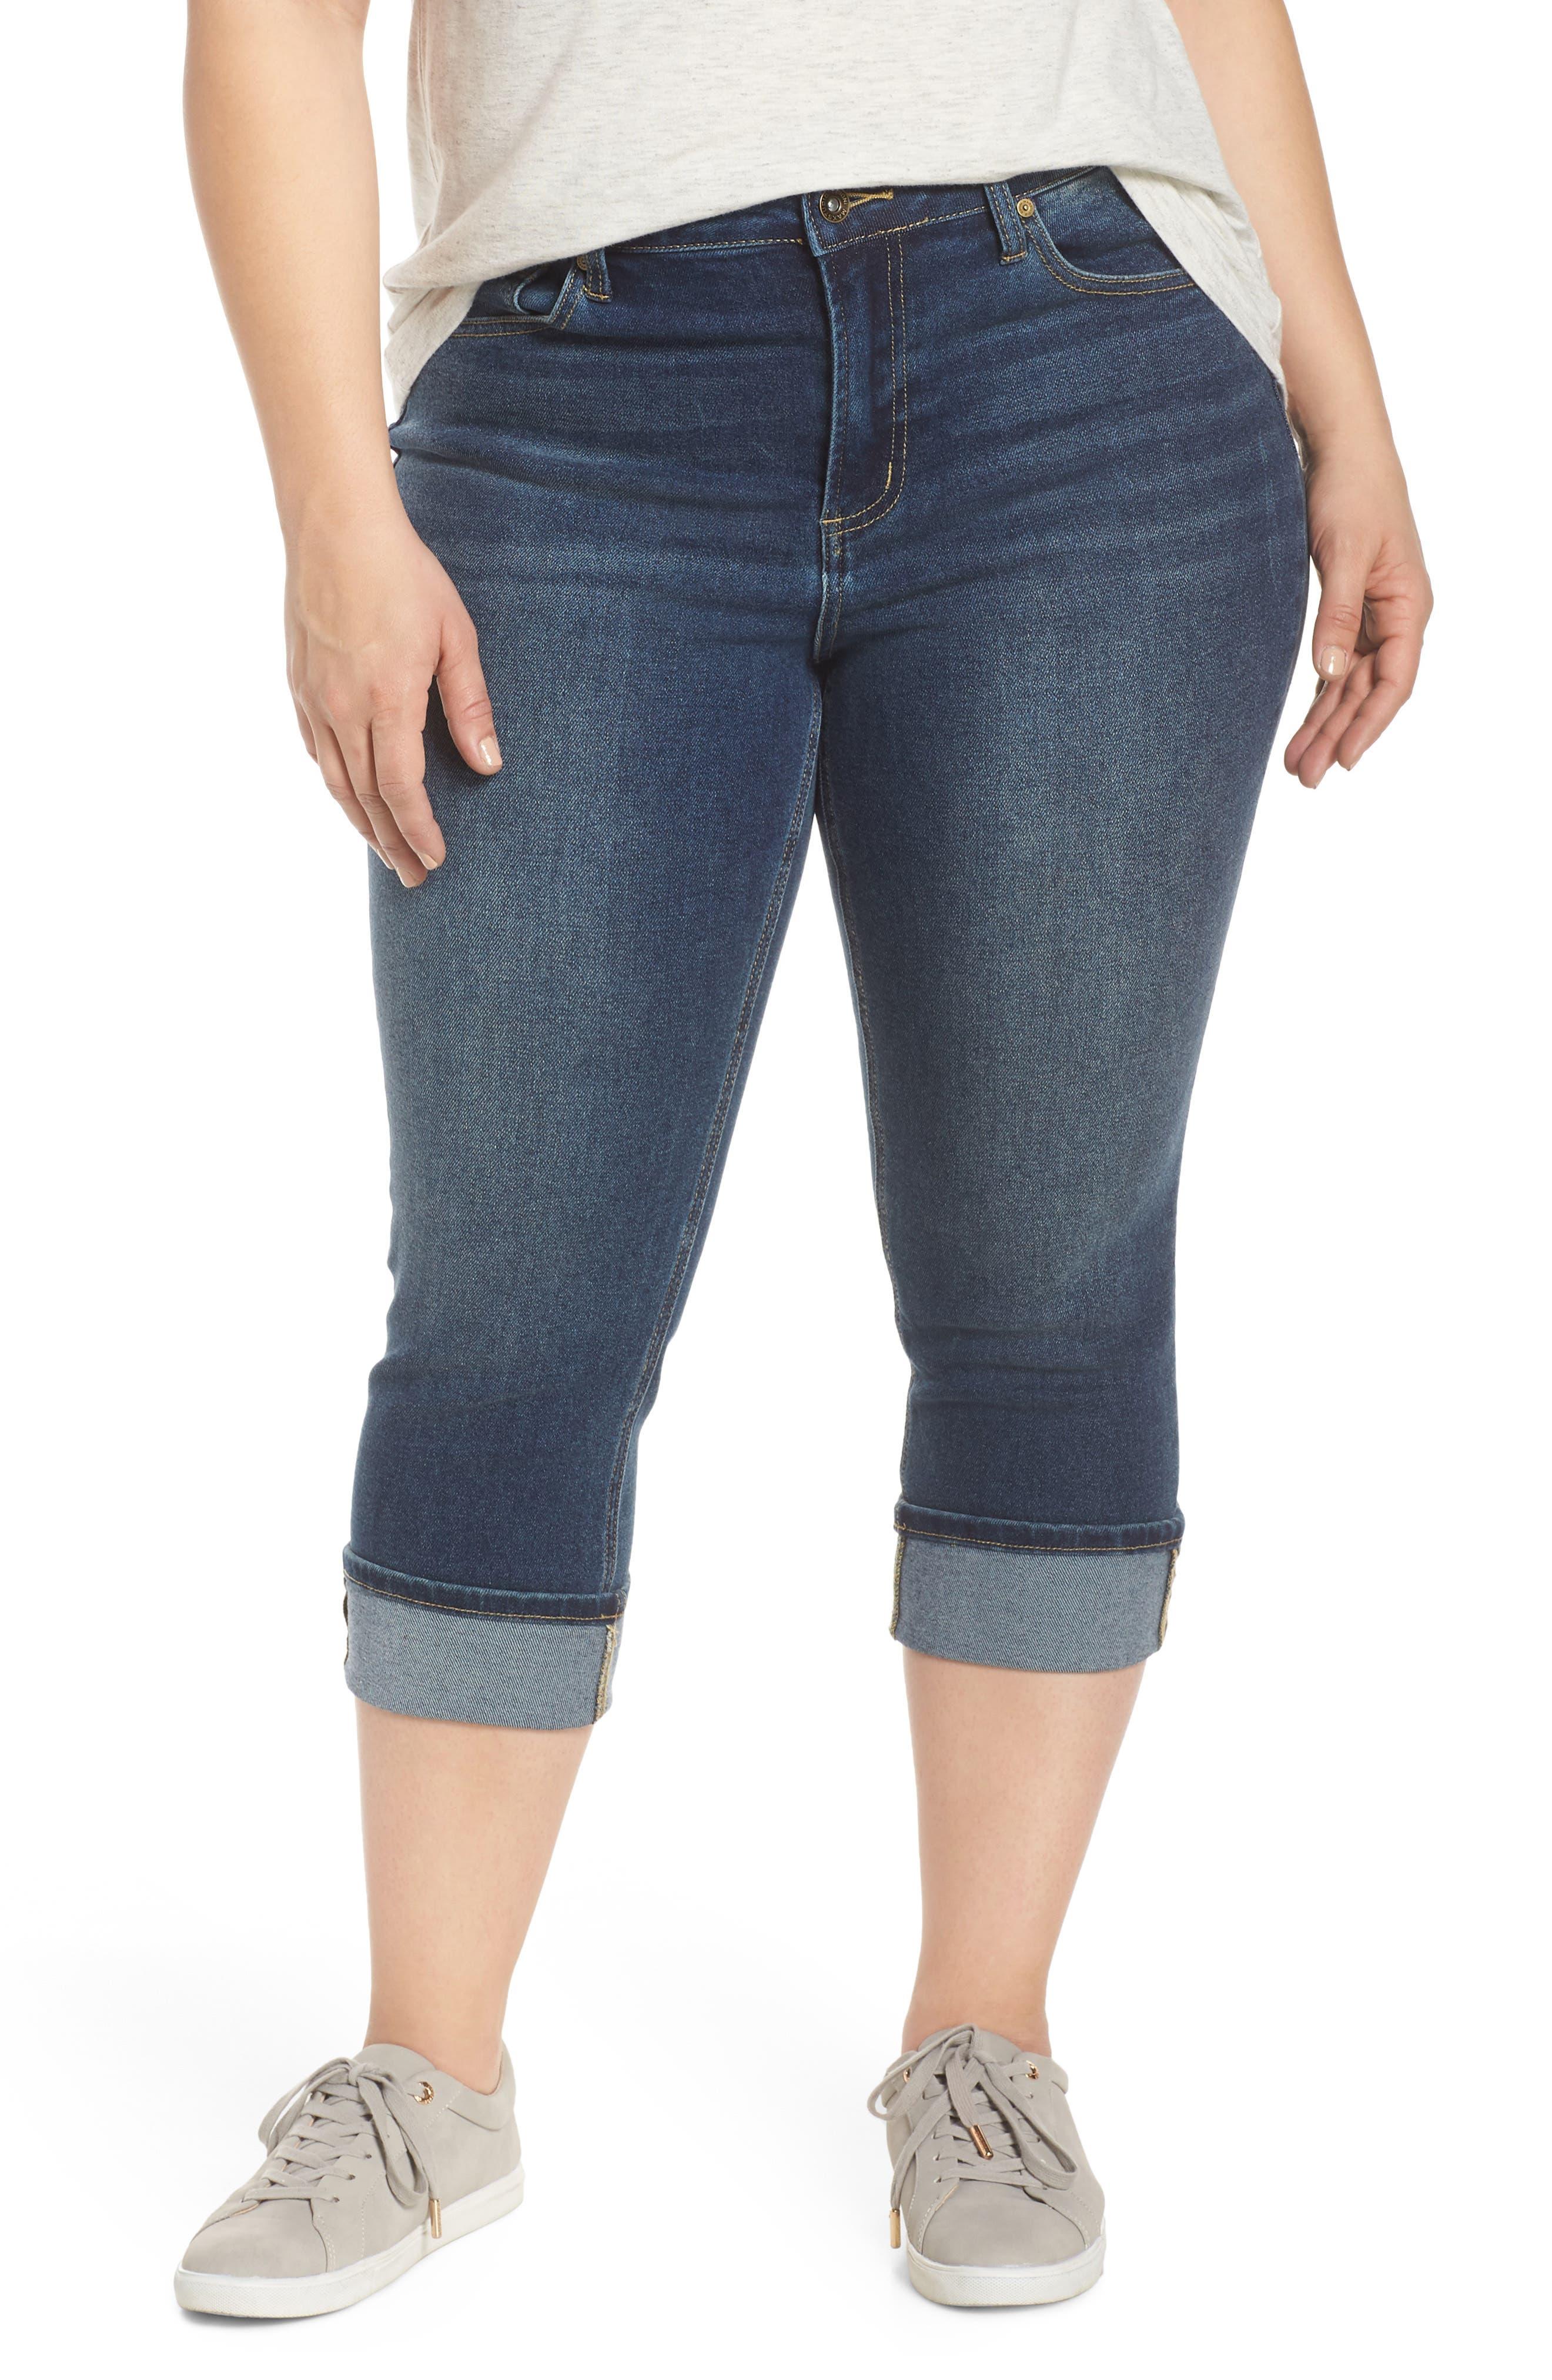 MAXSTUDIO INDIGO High Waist Crop Skinny Jeans, Main, color, JADE